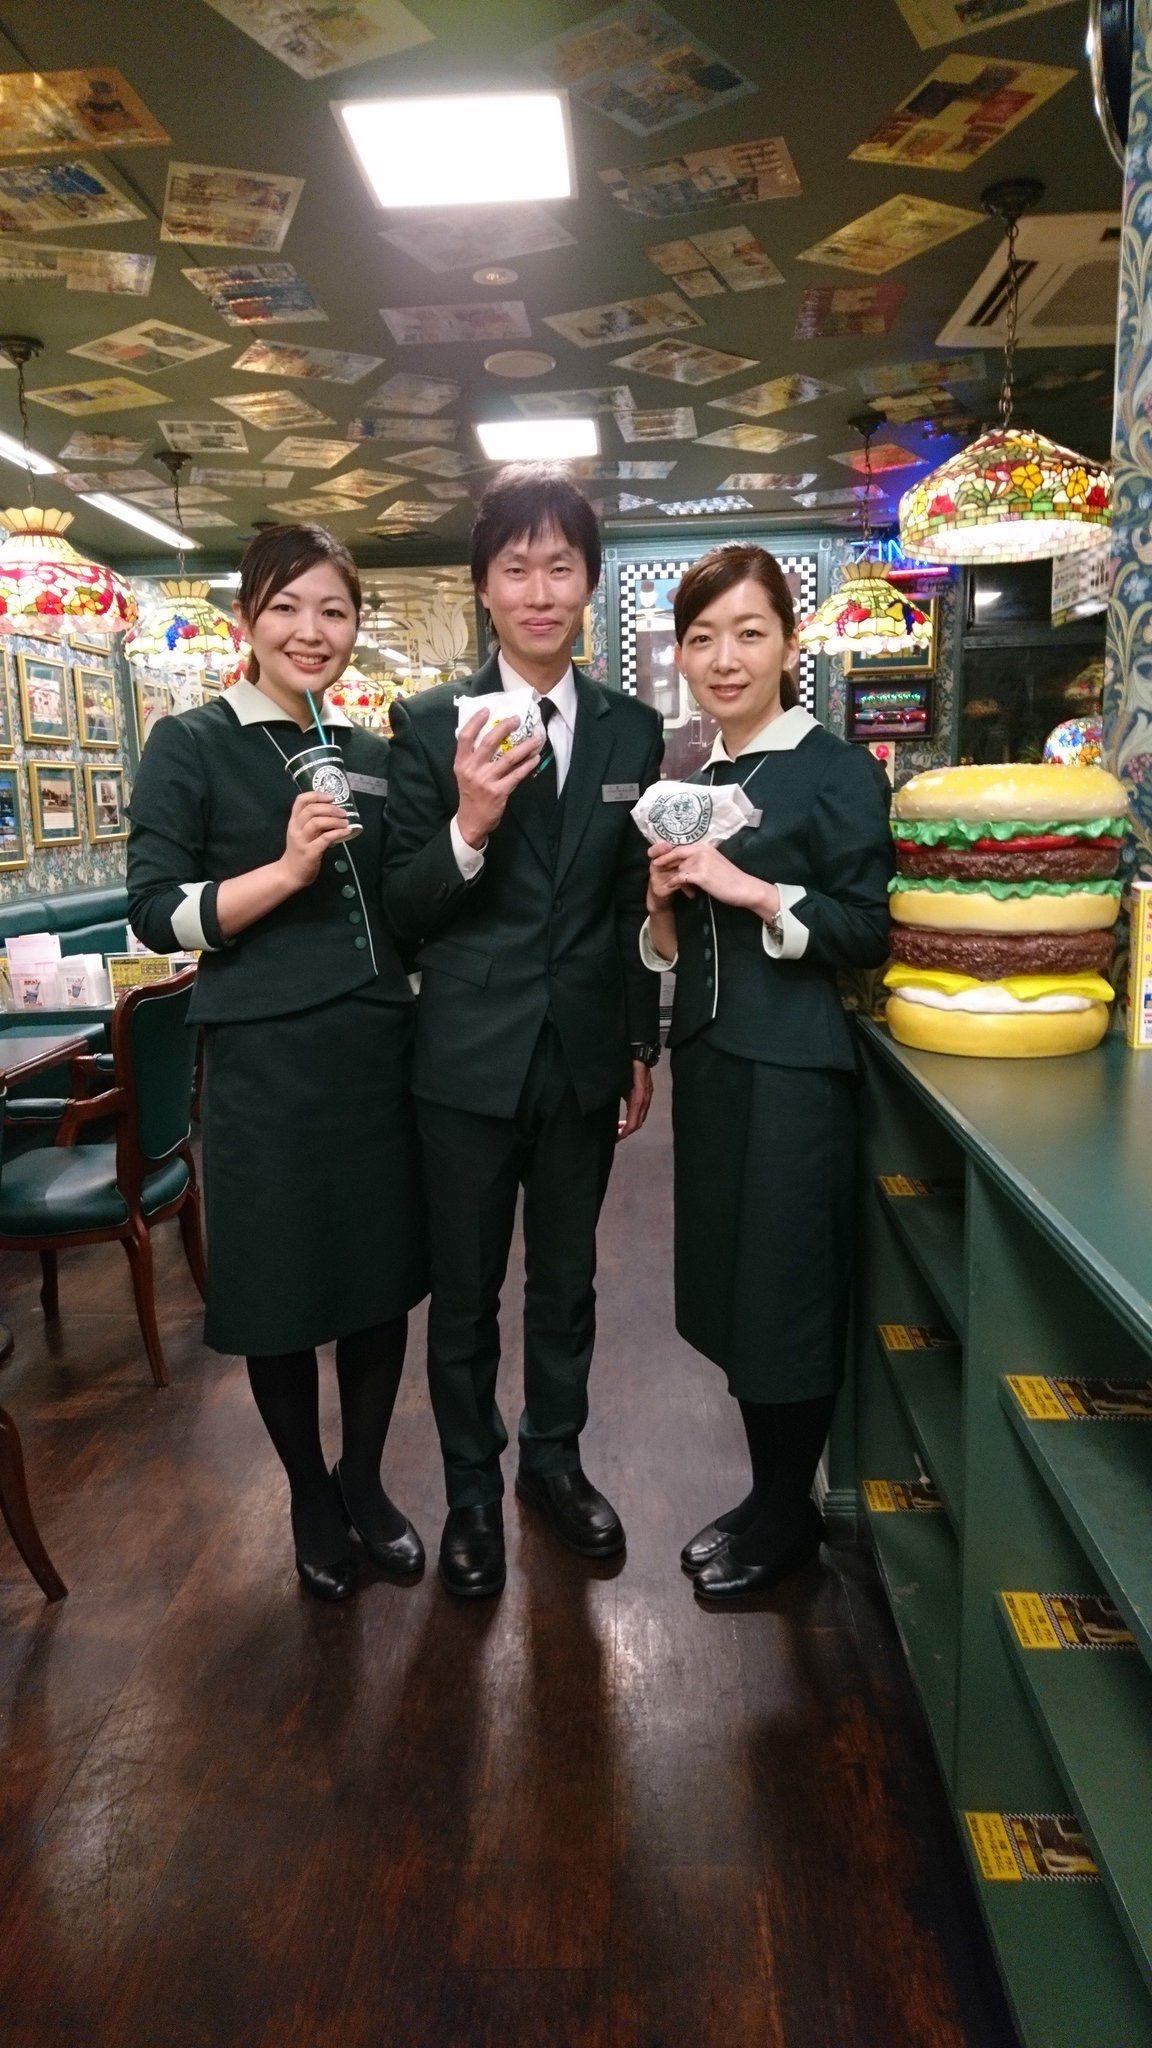 【Taiwan】 EVA Air ground staff / エバー航空 地上スタッフ 【台湾】 エバー航空